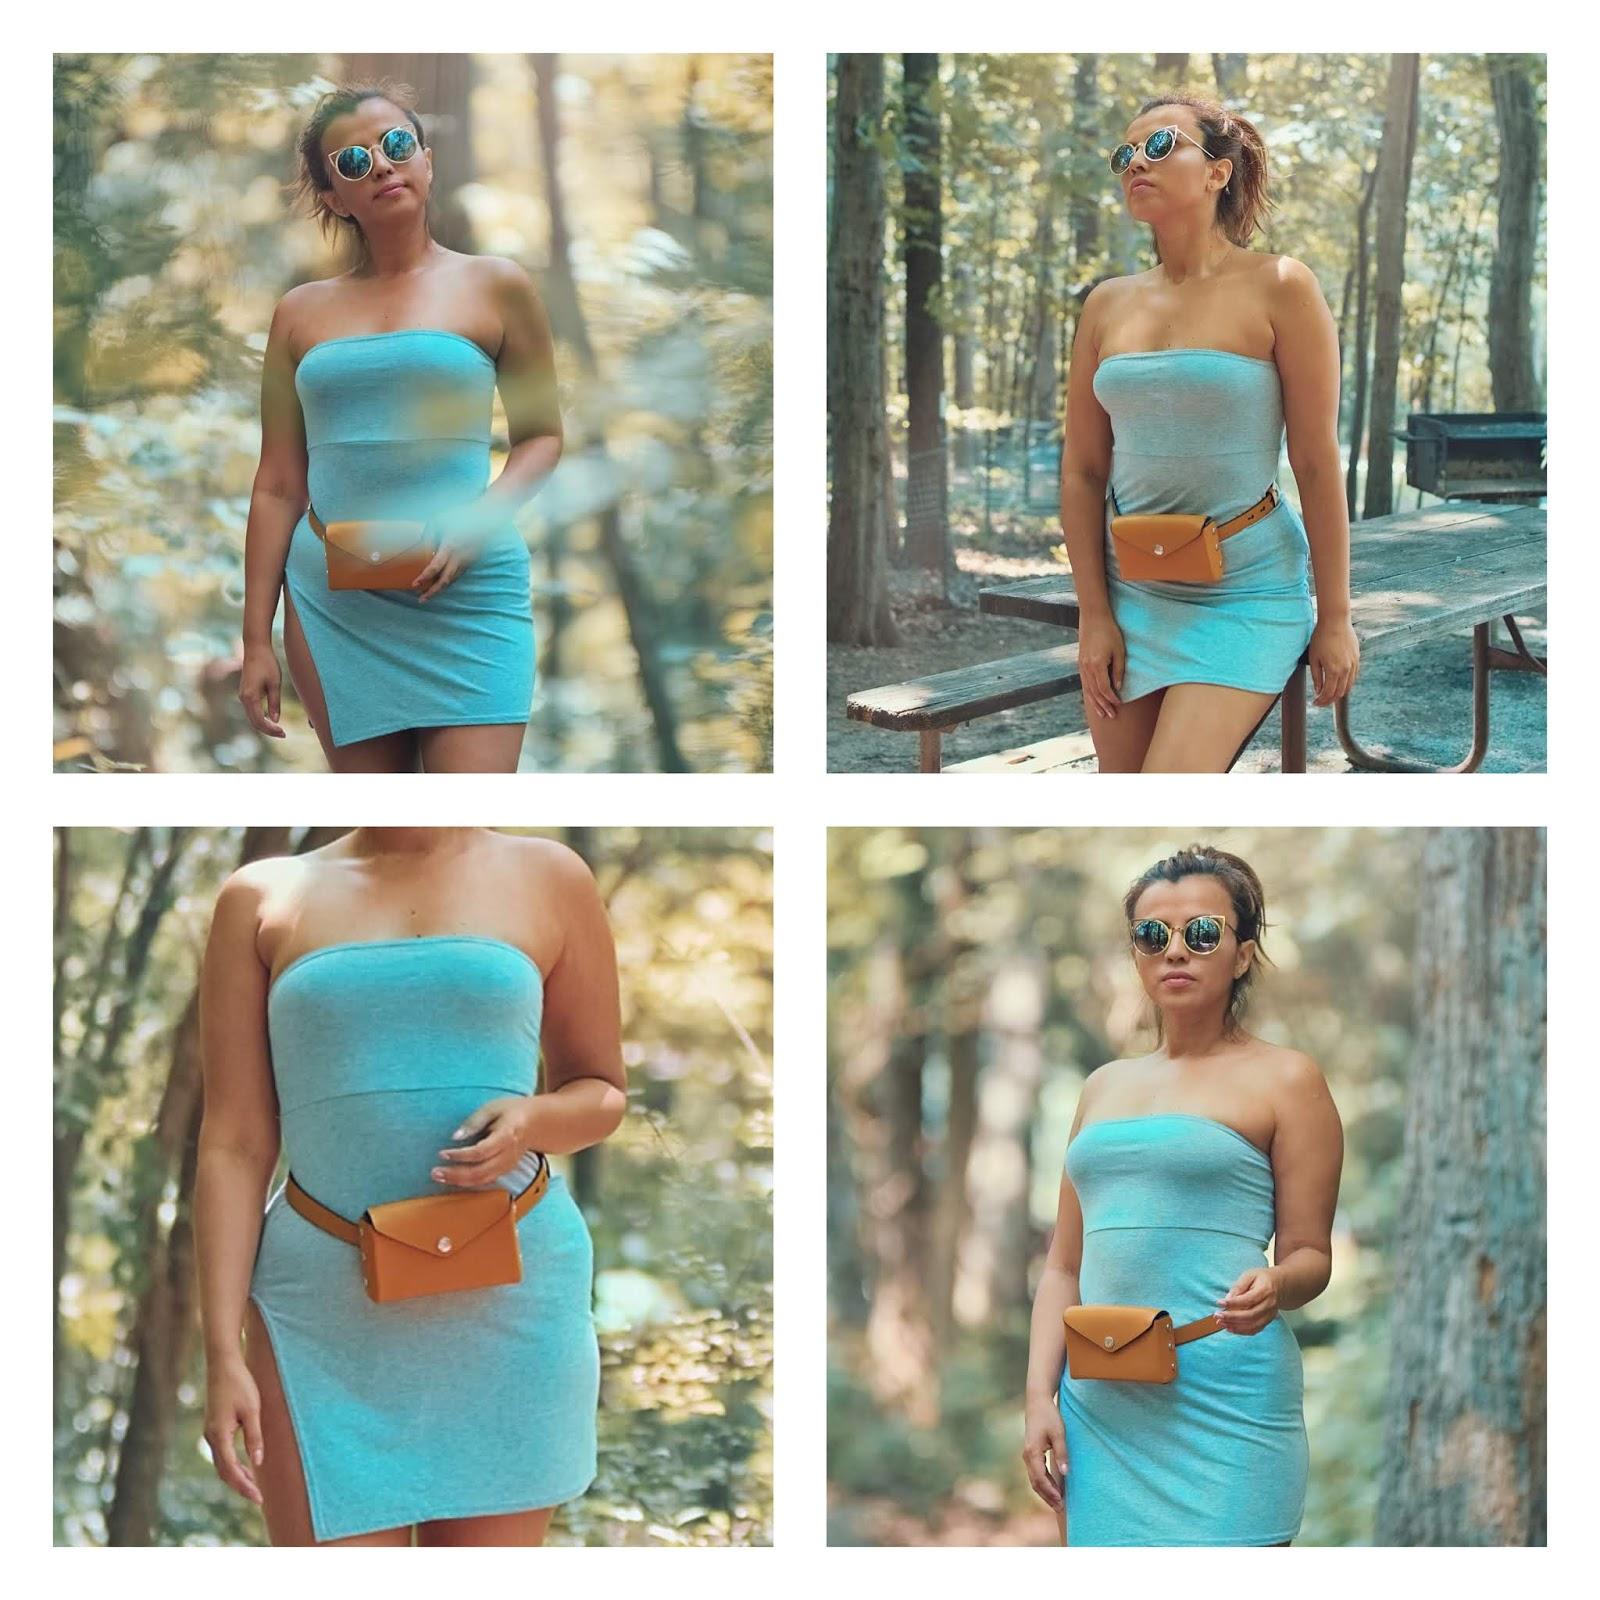 Grey Split Side Bandeau Bodycon Dress -mariestilo-lookoftheday-travel-traveller-blogger style-fashionblogger-marisolflamenco-femme luxe-luxegal-armandhugon-maryland state parks-mariestilo-lookoftheday-femme luxe-luxegal-armandhugon-dcblogger-